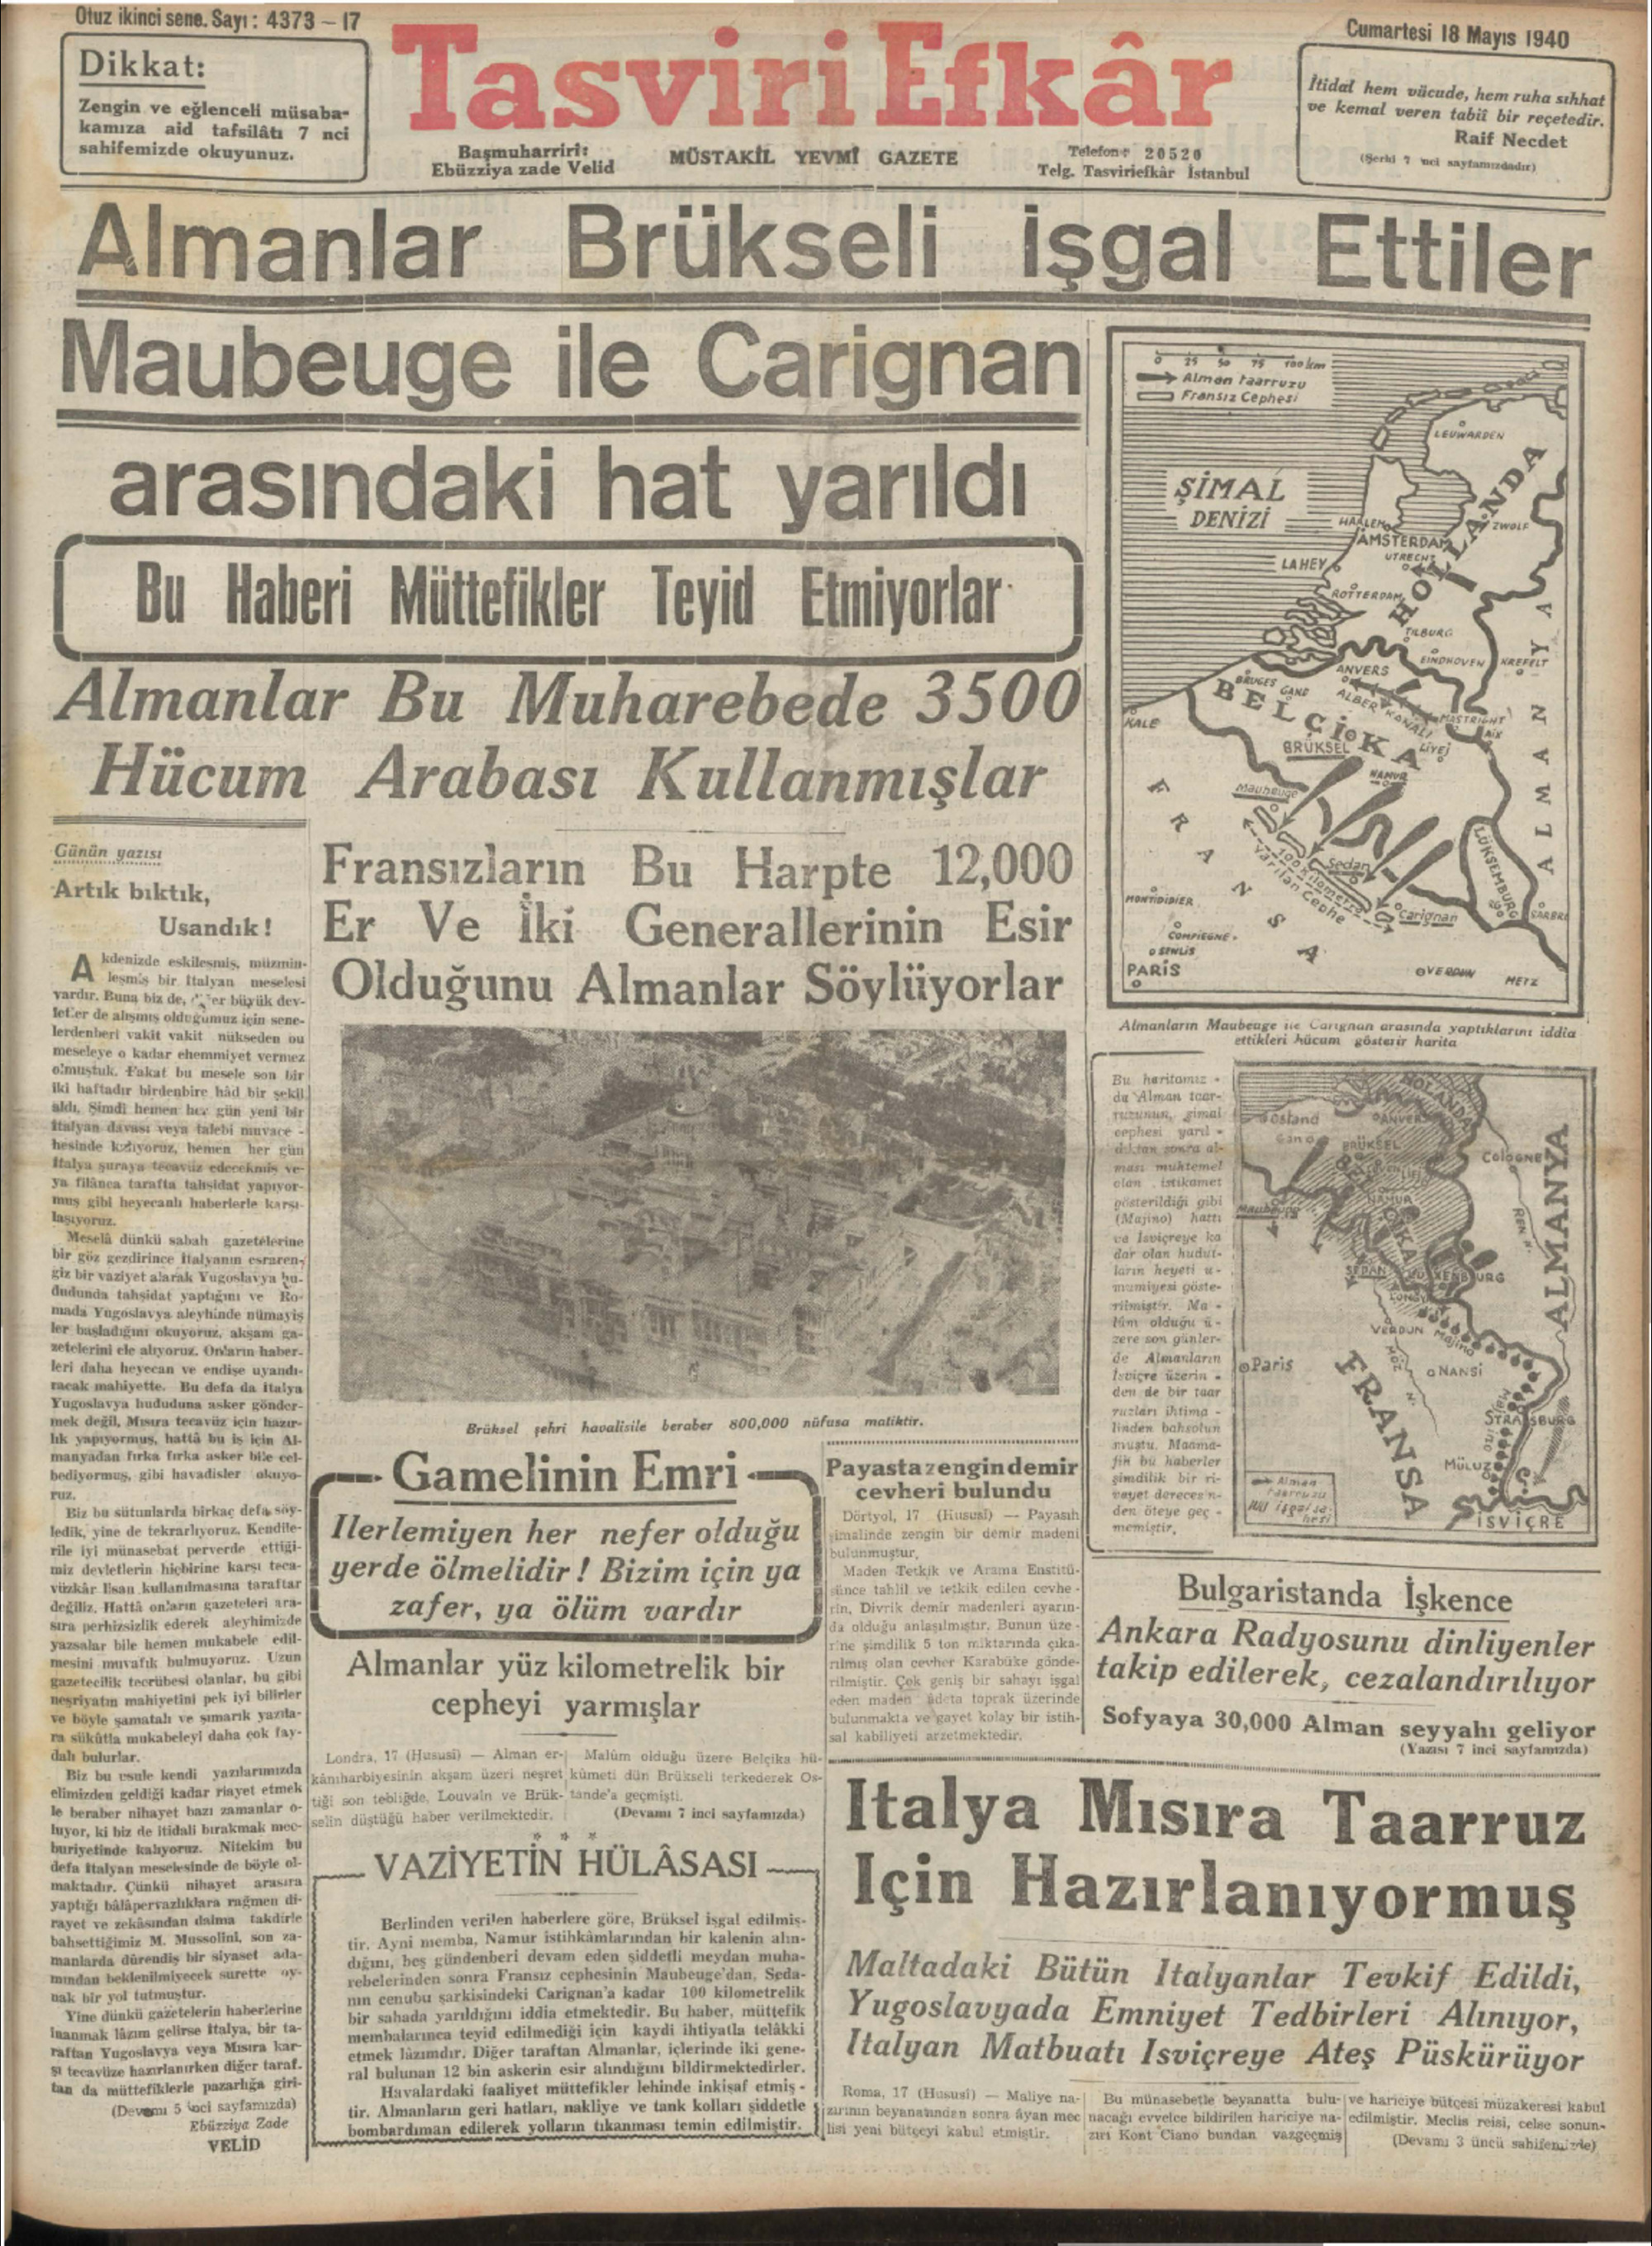 18 Mayıs 1940 Tarihli Tasviri Efkar Gazetesi Sayfa 1